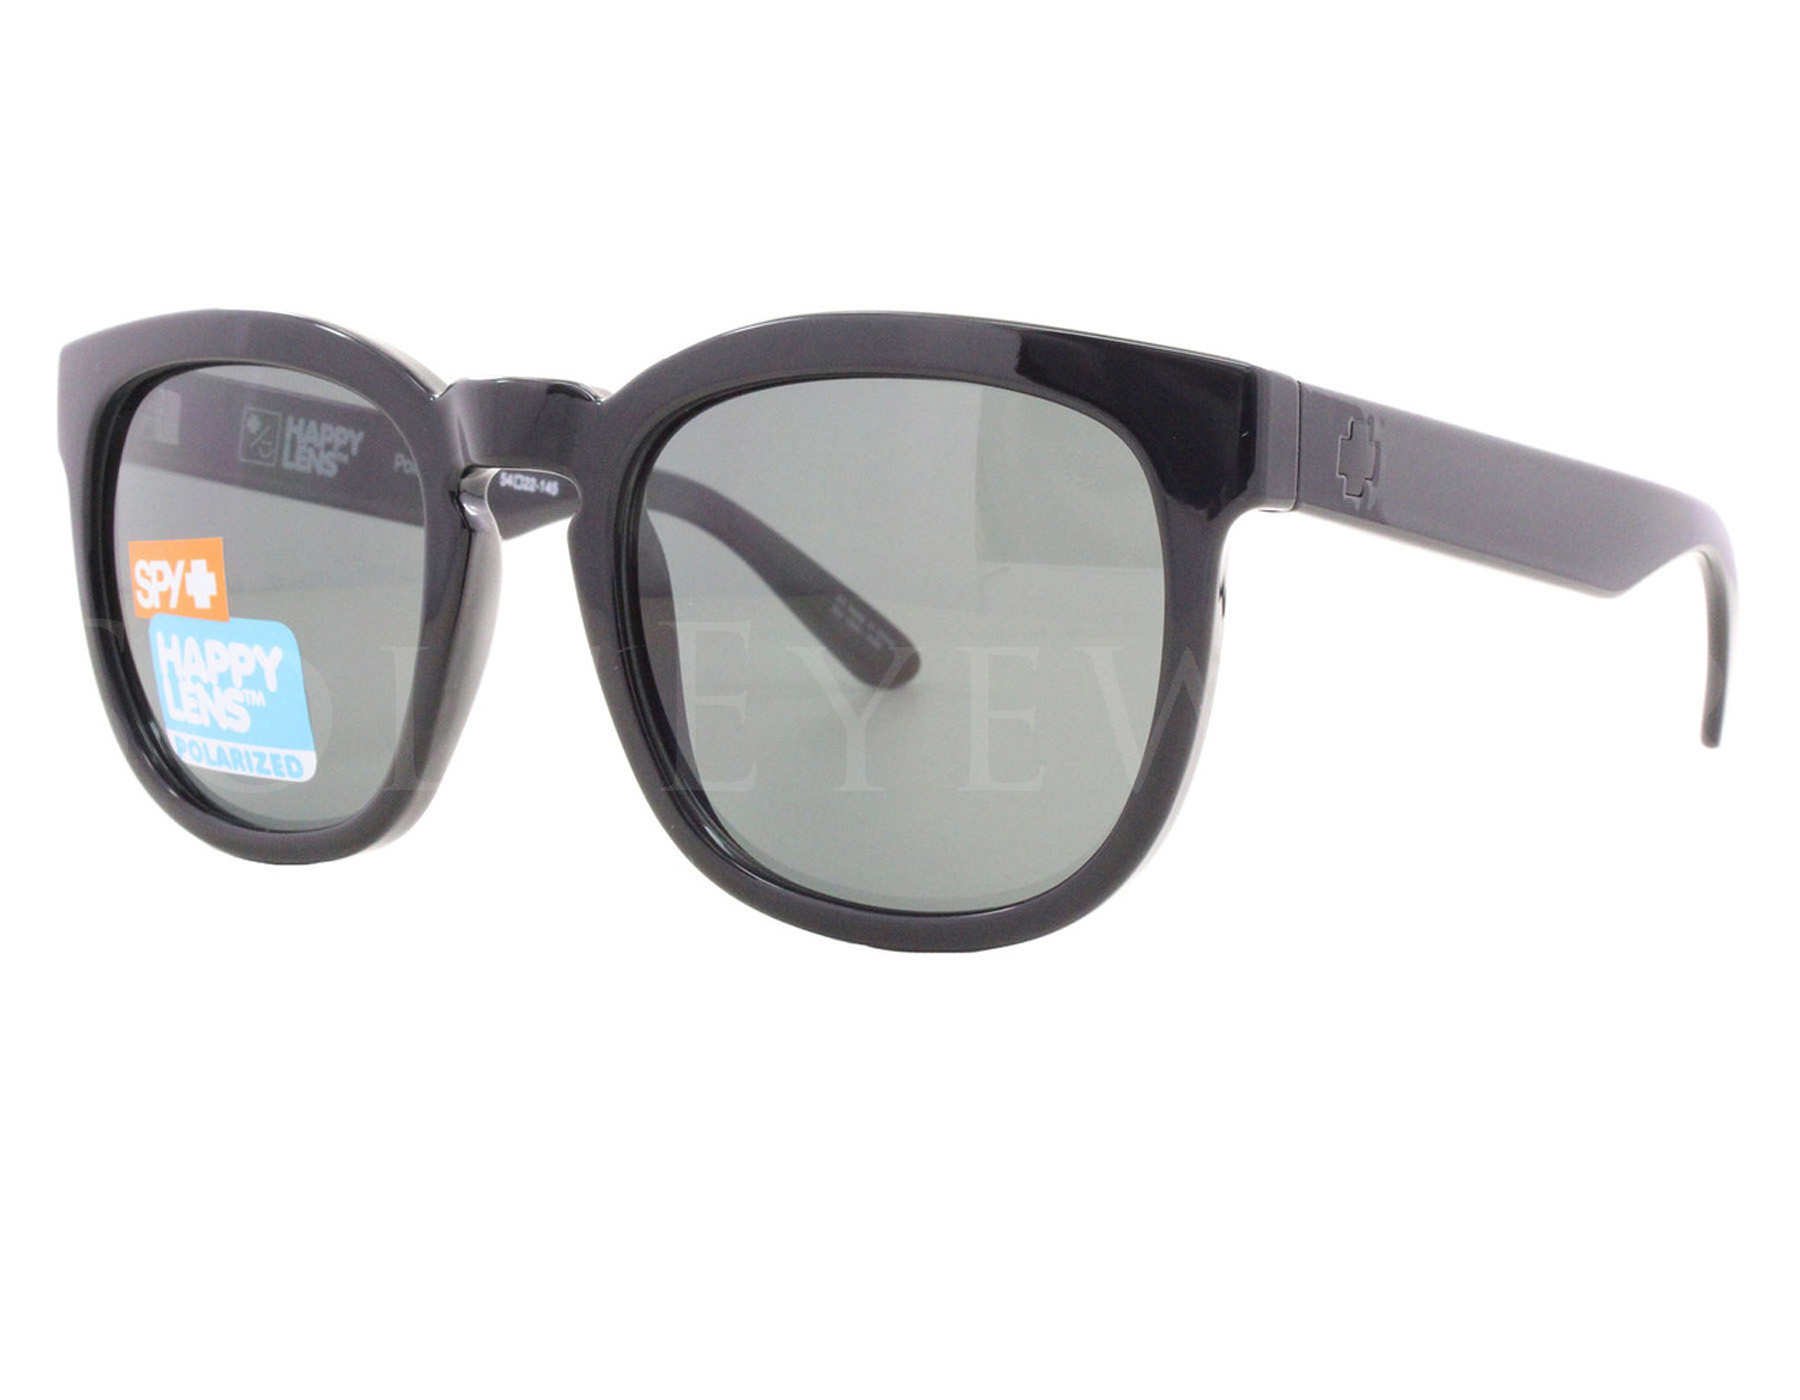 d329e1862d5 Details about NEW Spy Optics Quinn 673179038864 Black   Happy Grey Green  Polarized Sunglasses